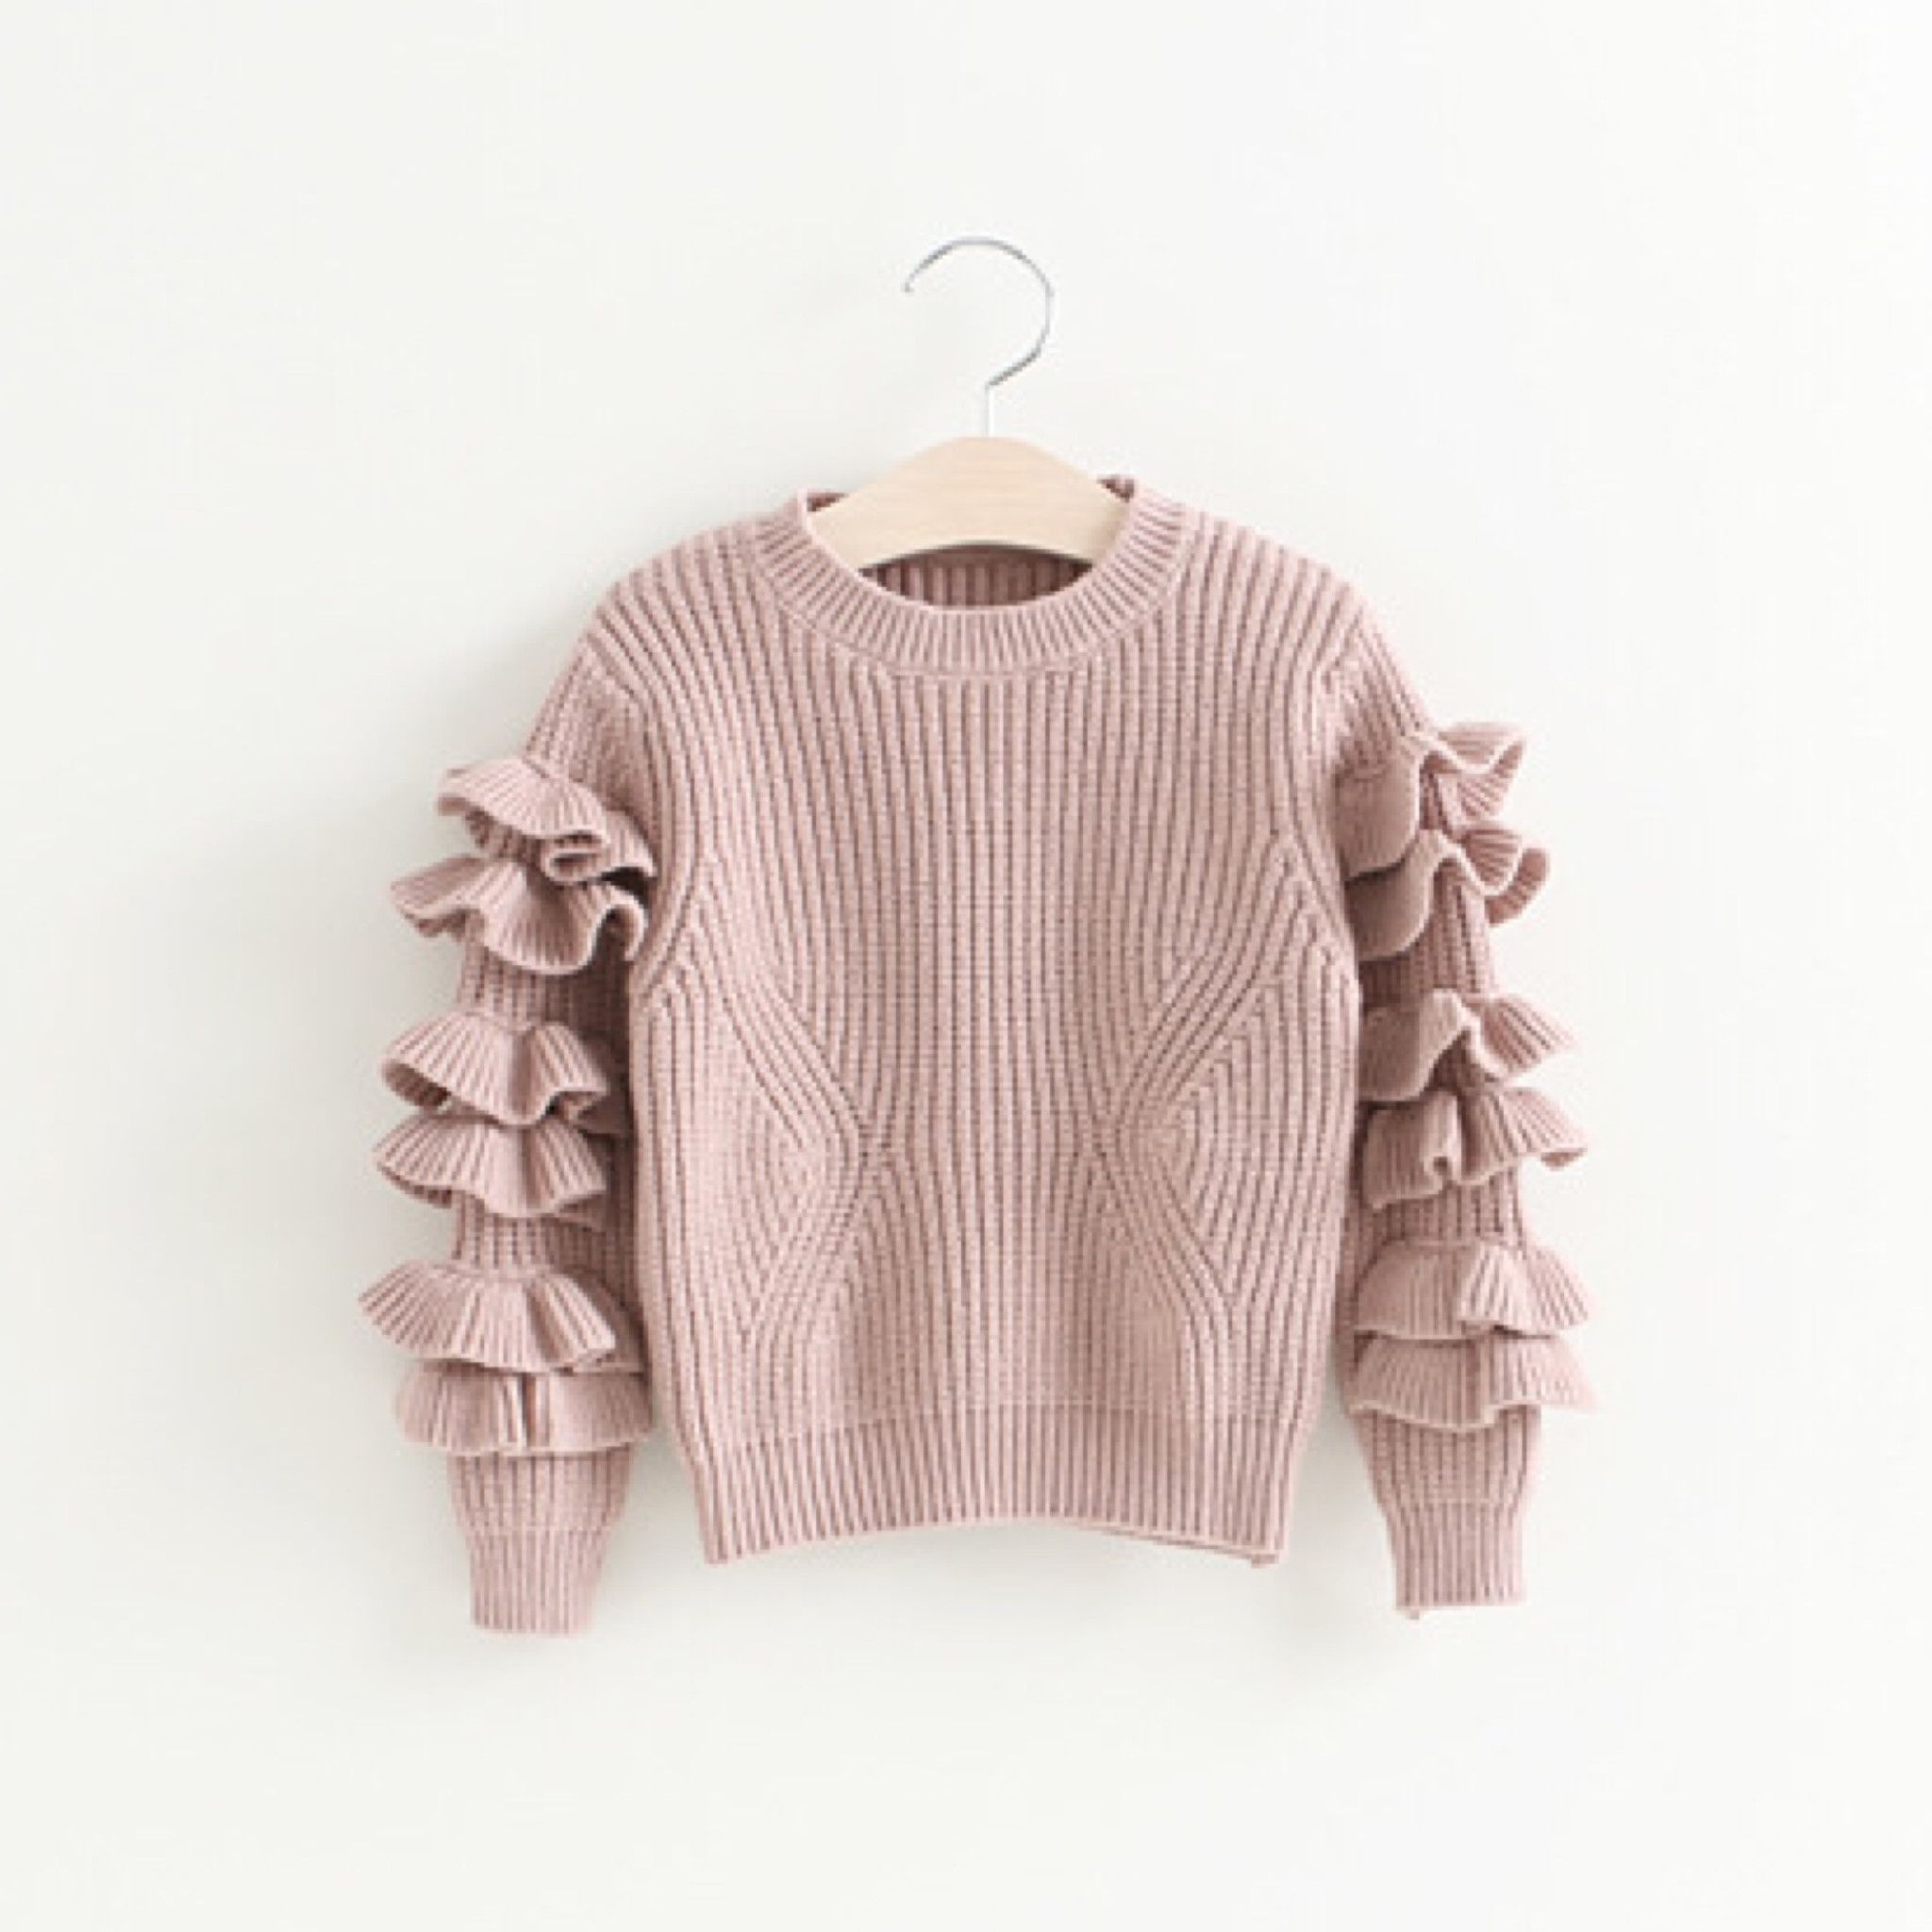 Maddie ~ Ruffle Sleeved Sweater